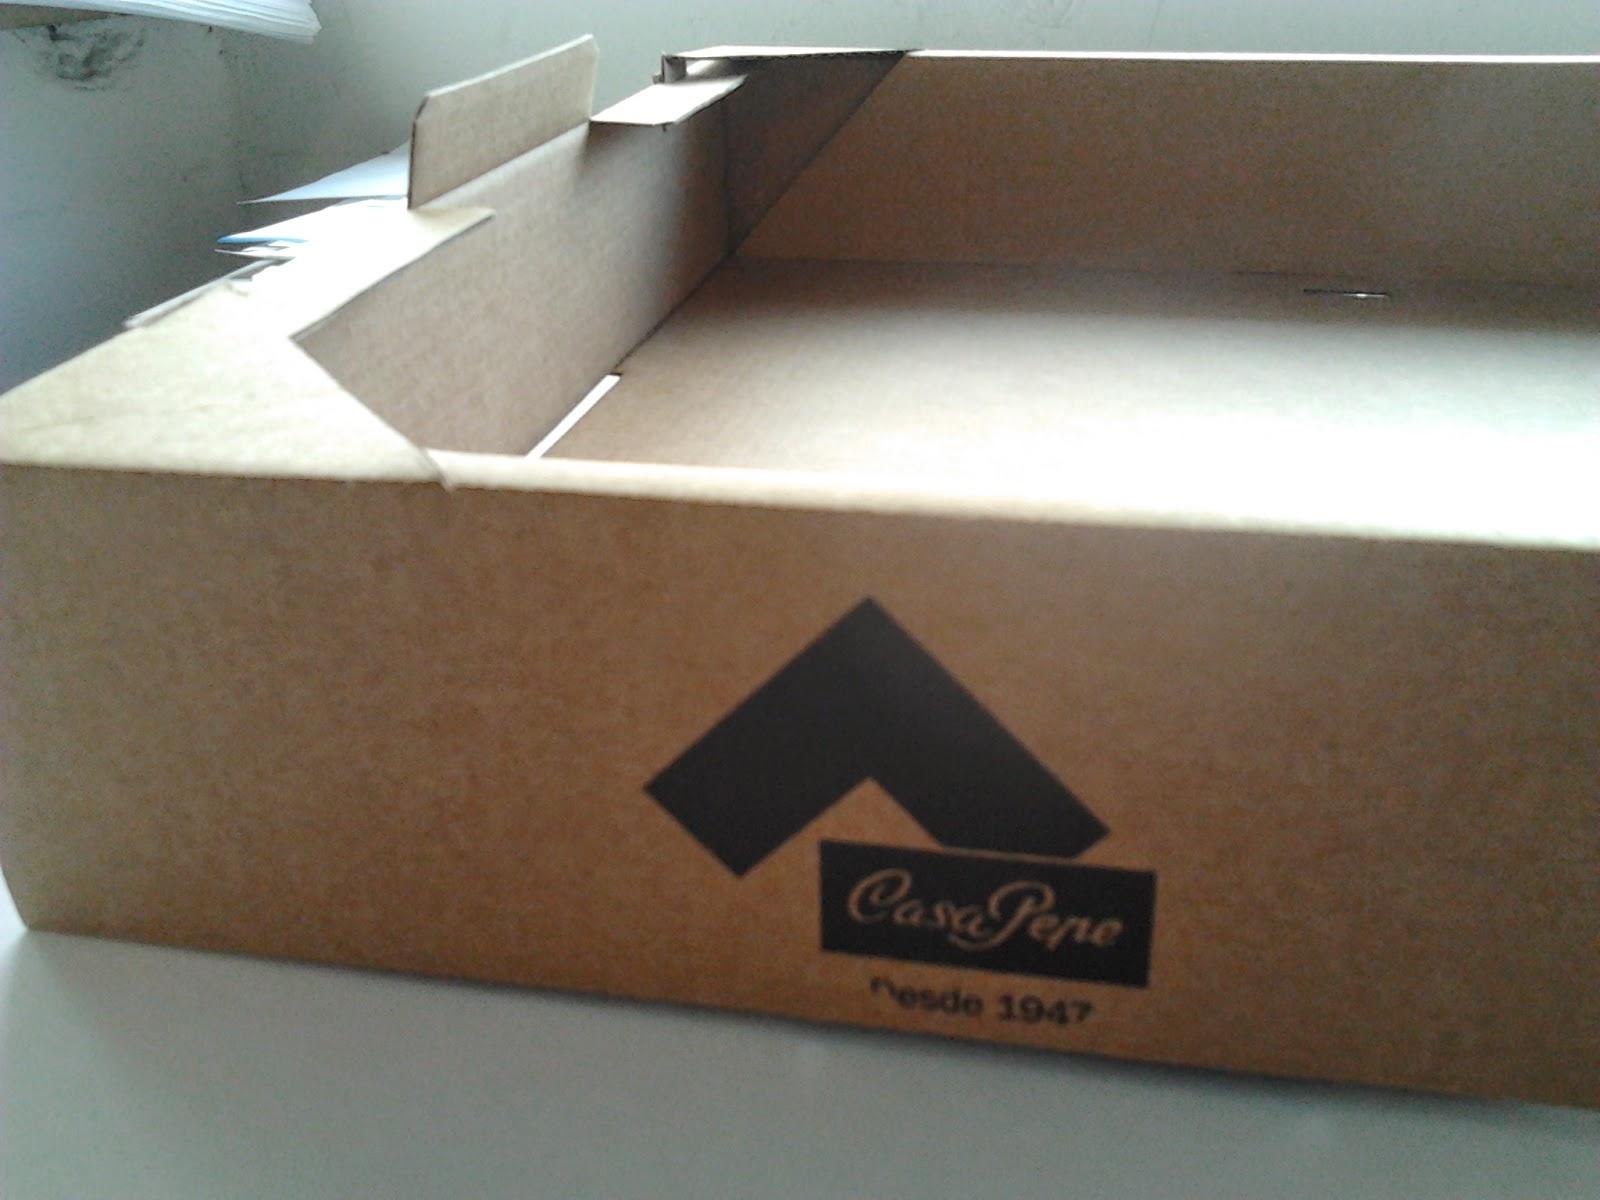 cubeta de reparto de cartón, apilable y con tapa